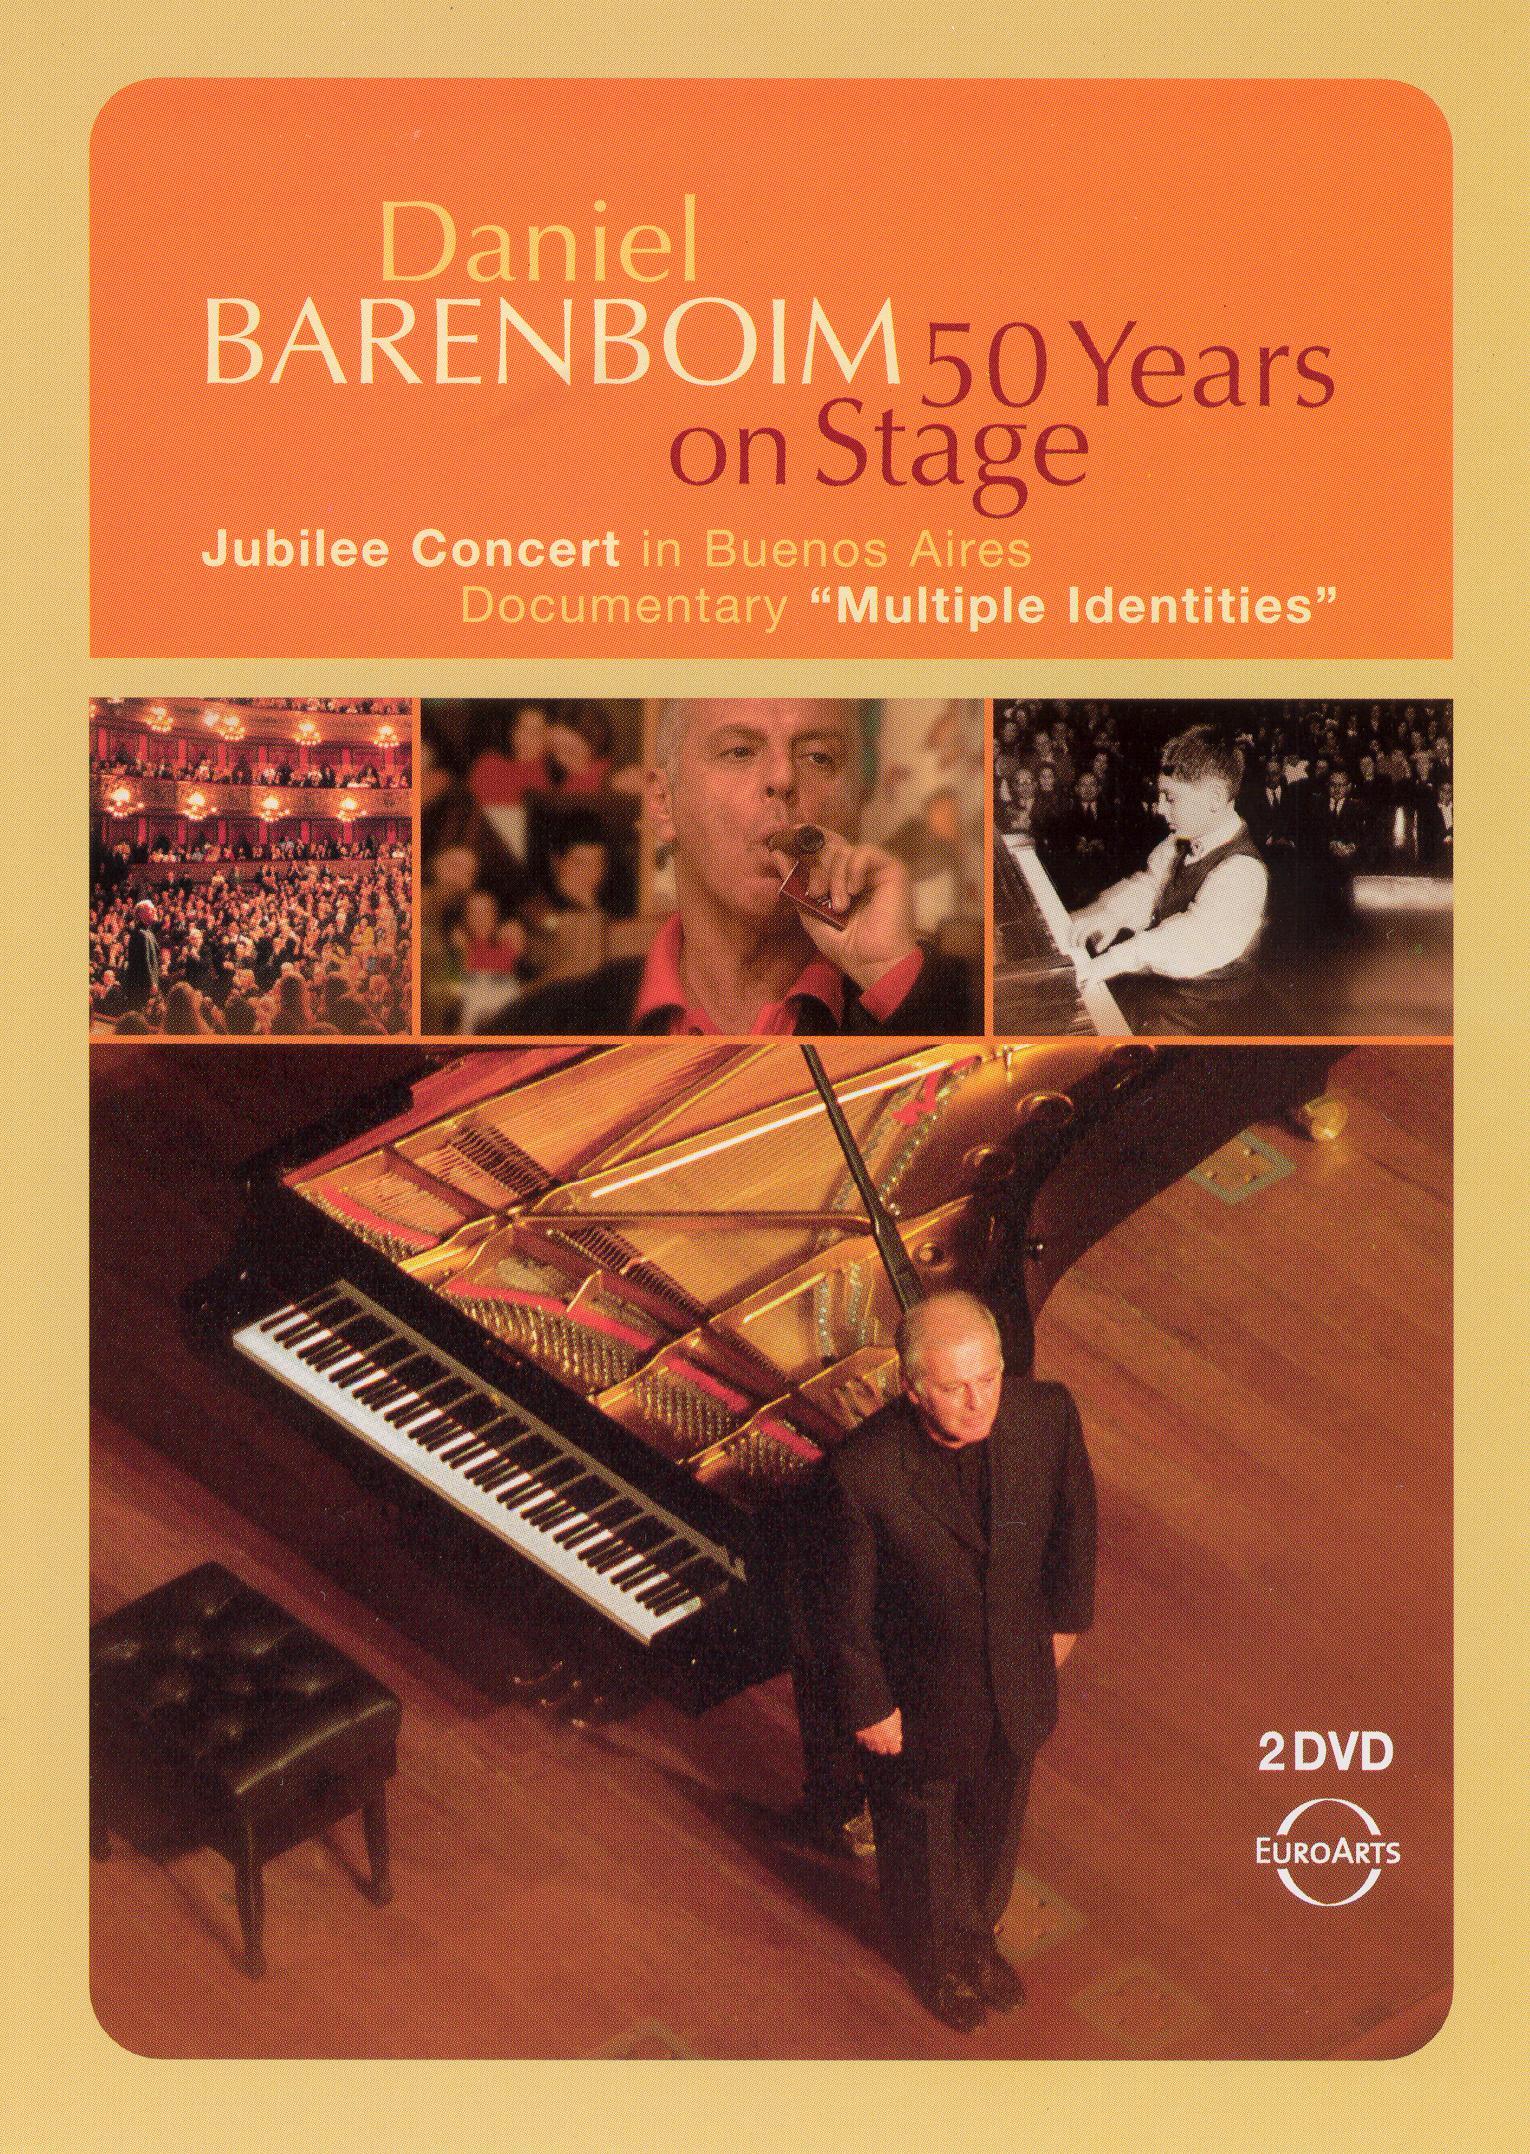 Daniel Barenboim: 50 Years On Stage